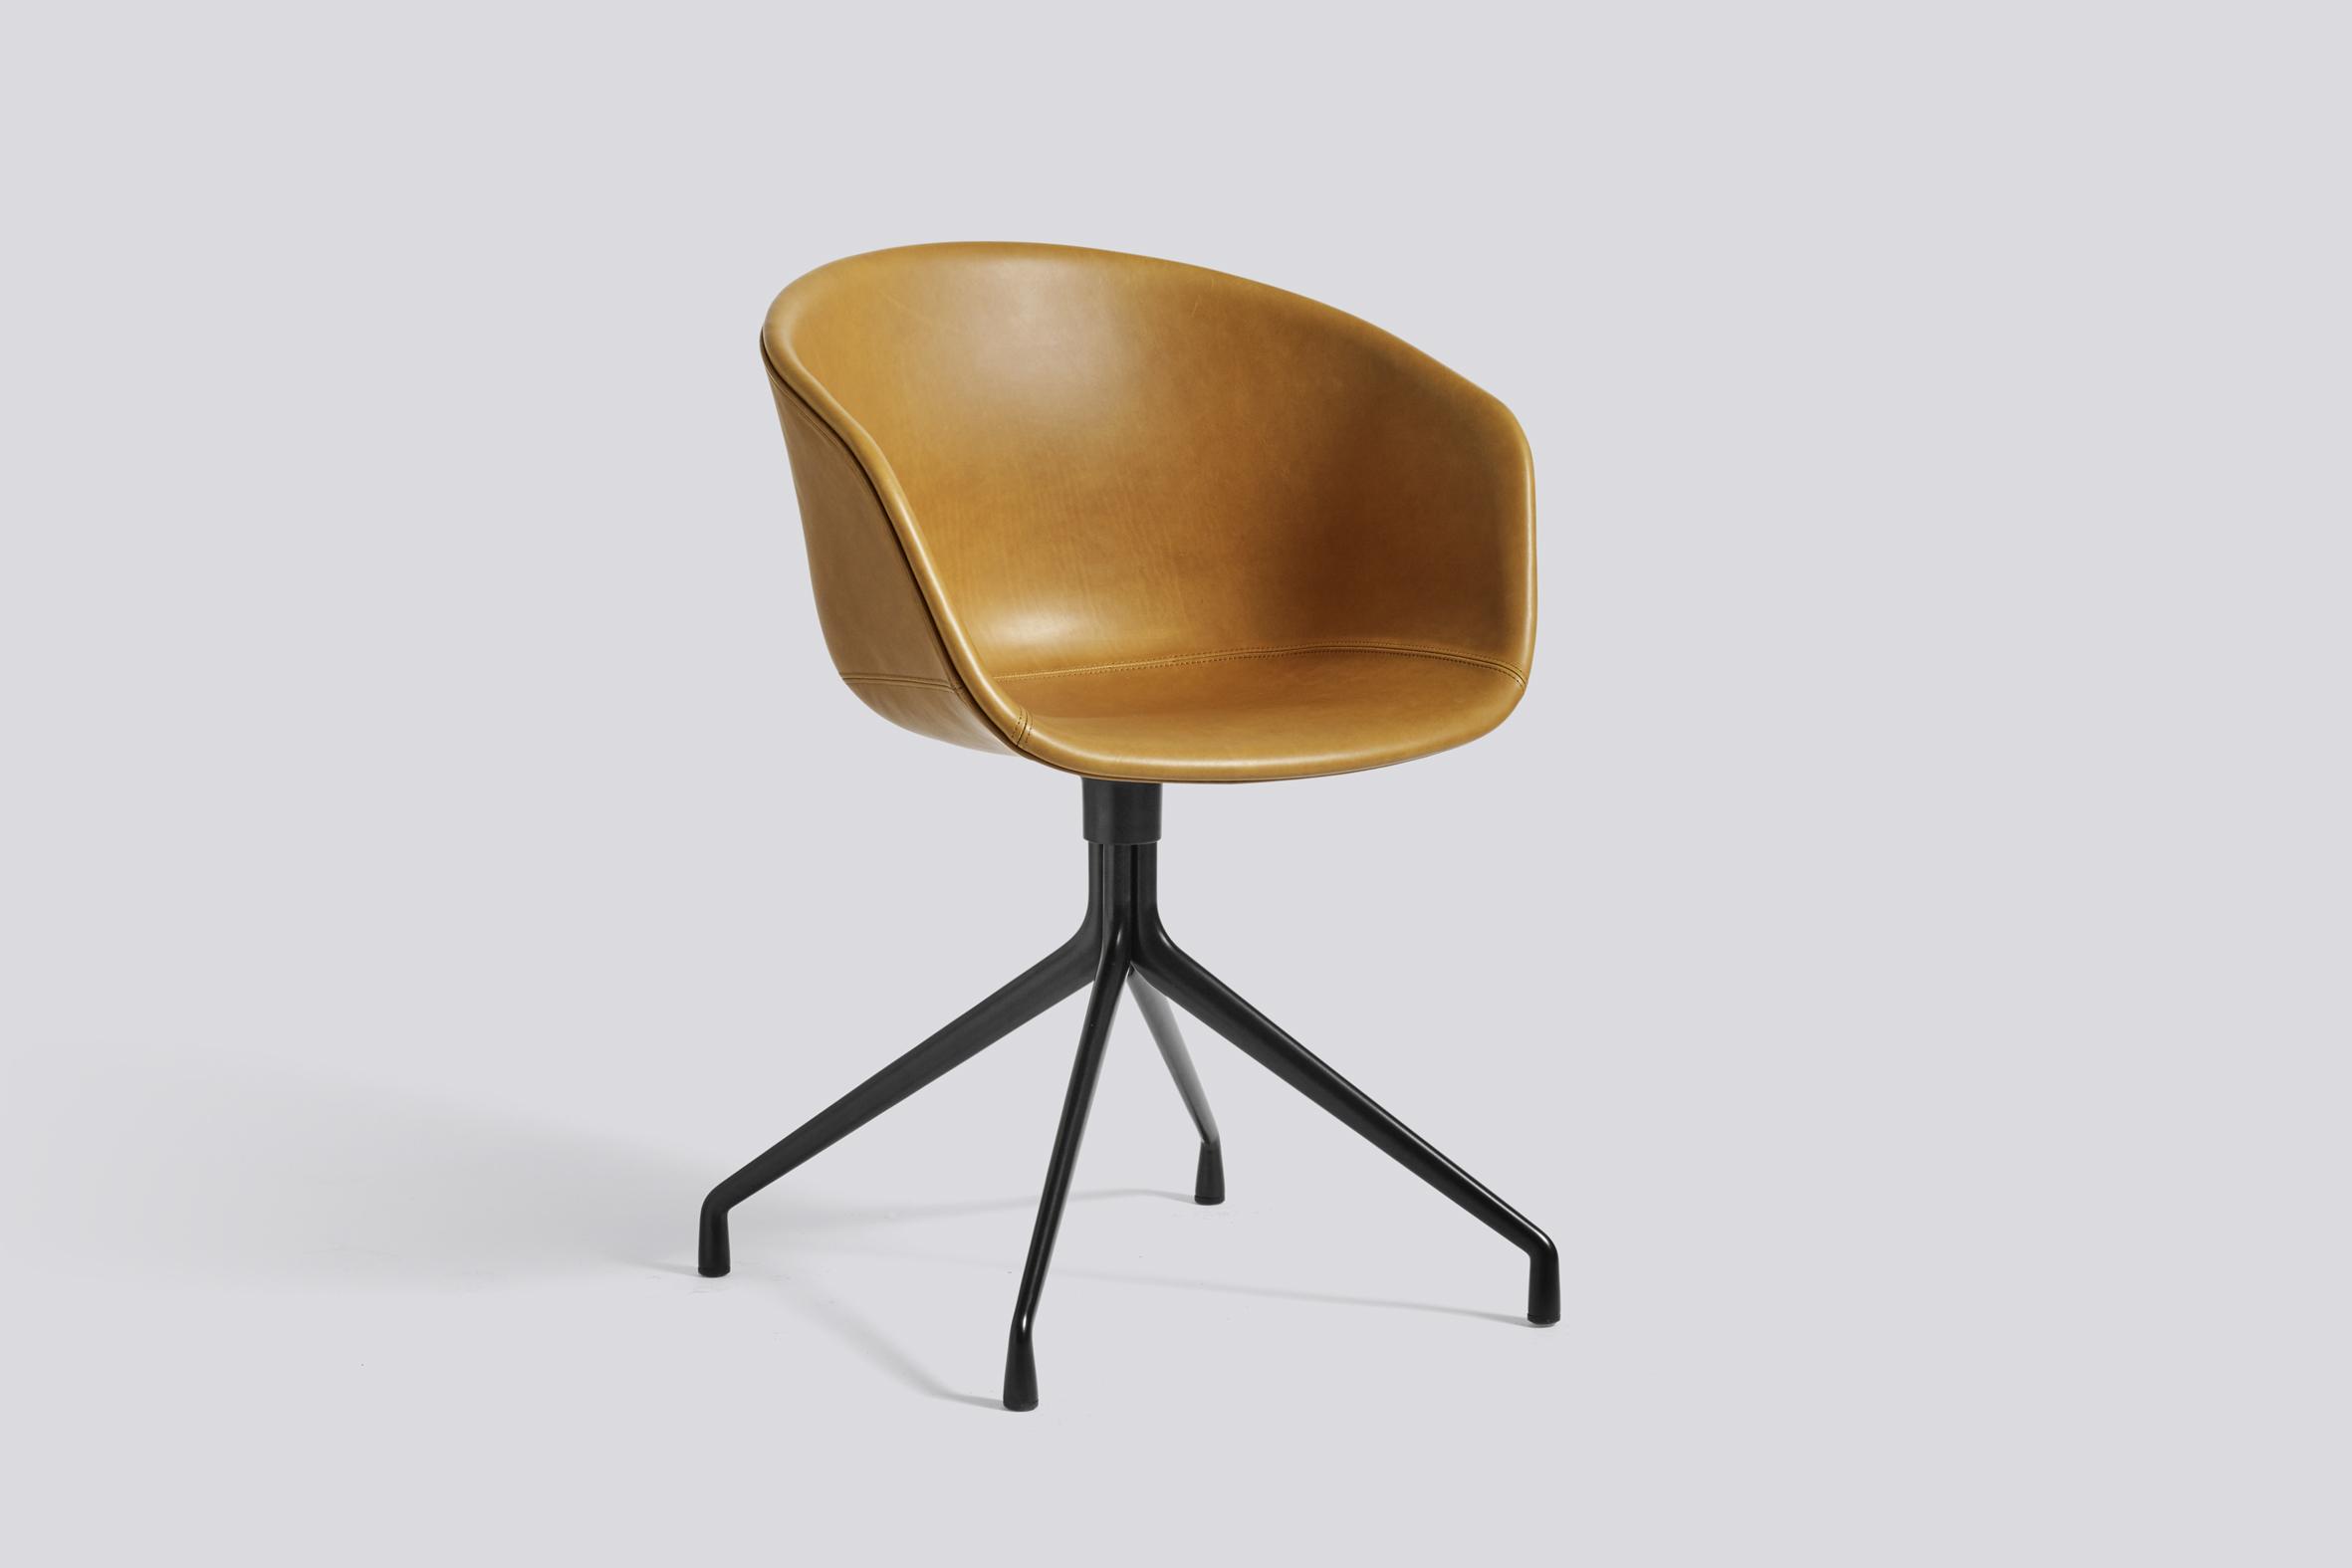 aac21 von hay stylepark. Black Bedroom Furniture Sets. Home Design Ideas